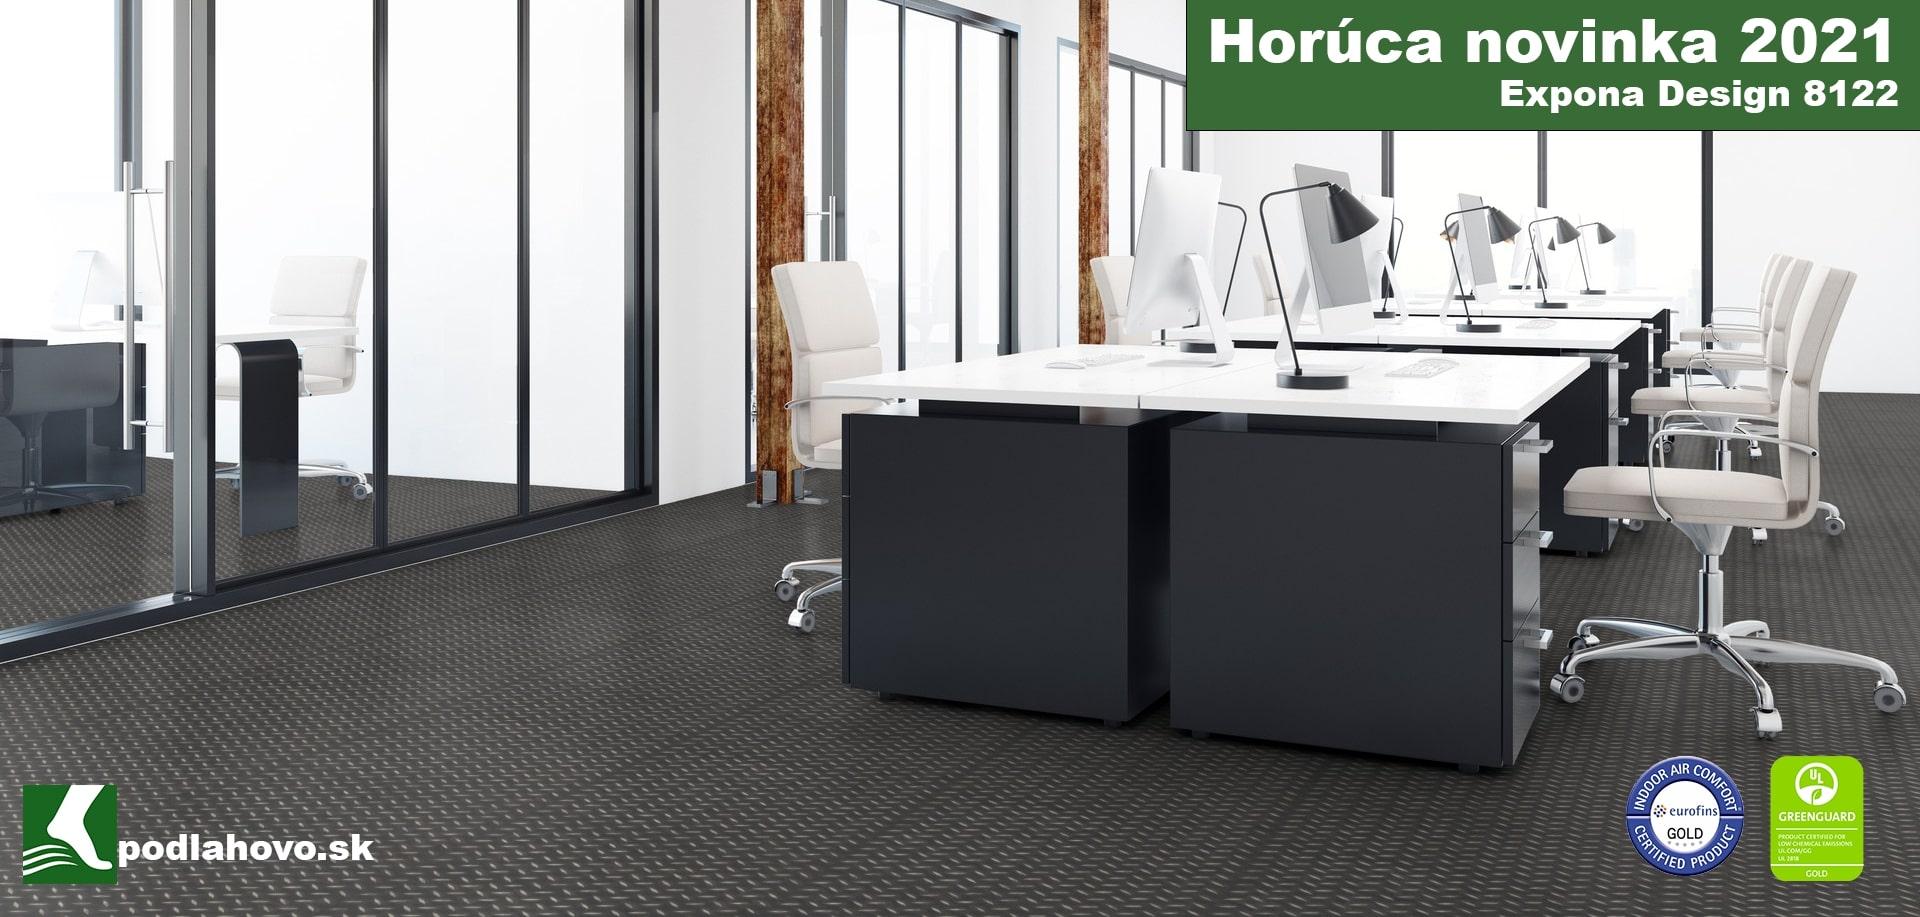 Expona Design 8122 Black Treadplate - Vinylové podlahy